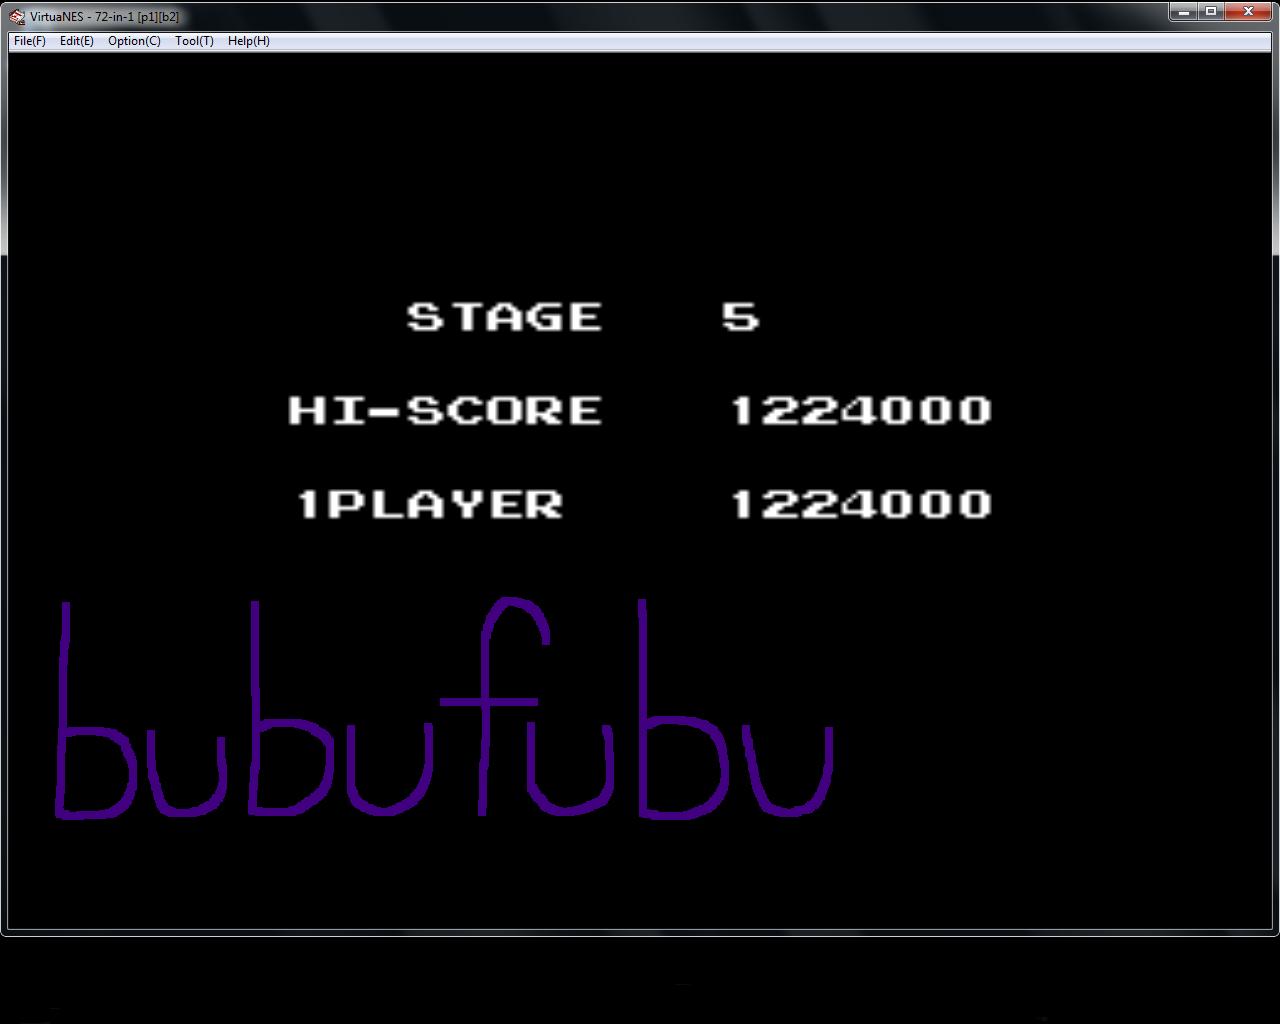 bubufubu: TwinBee (NES/Famicom Emulated) 1,224,000 points on 2015-06-01 20:27:31